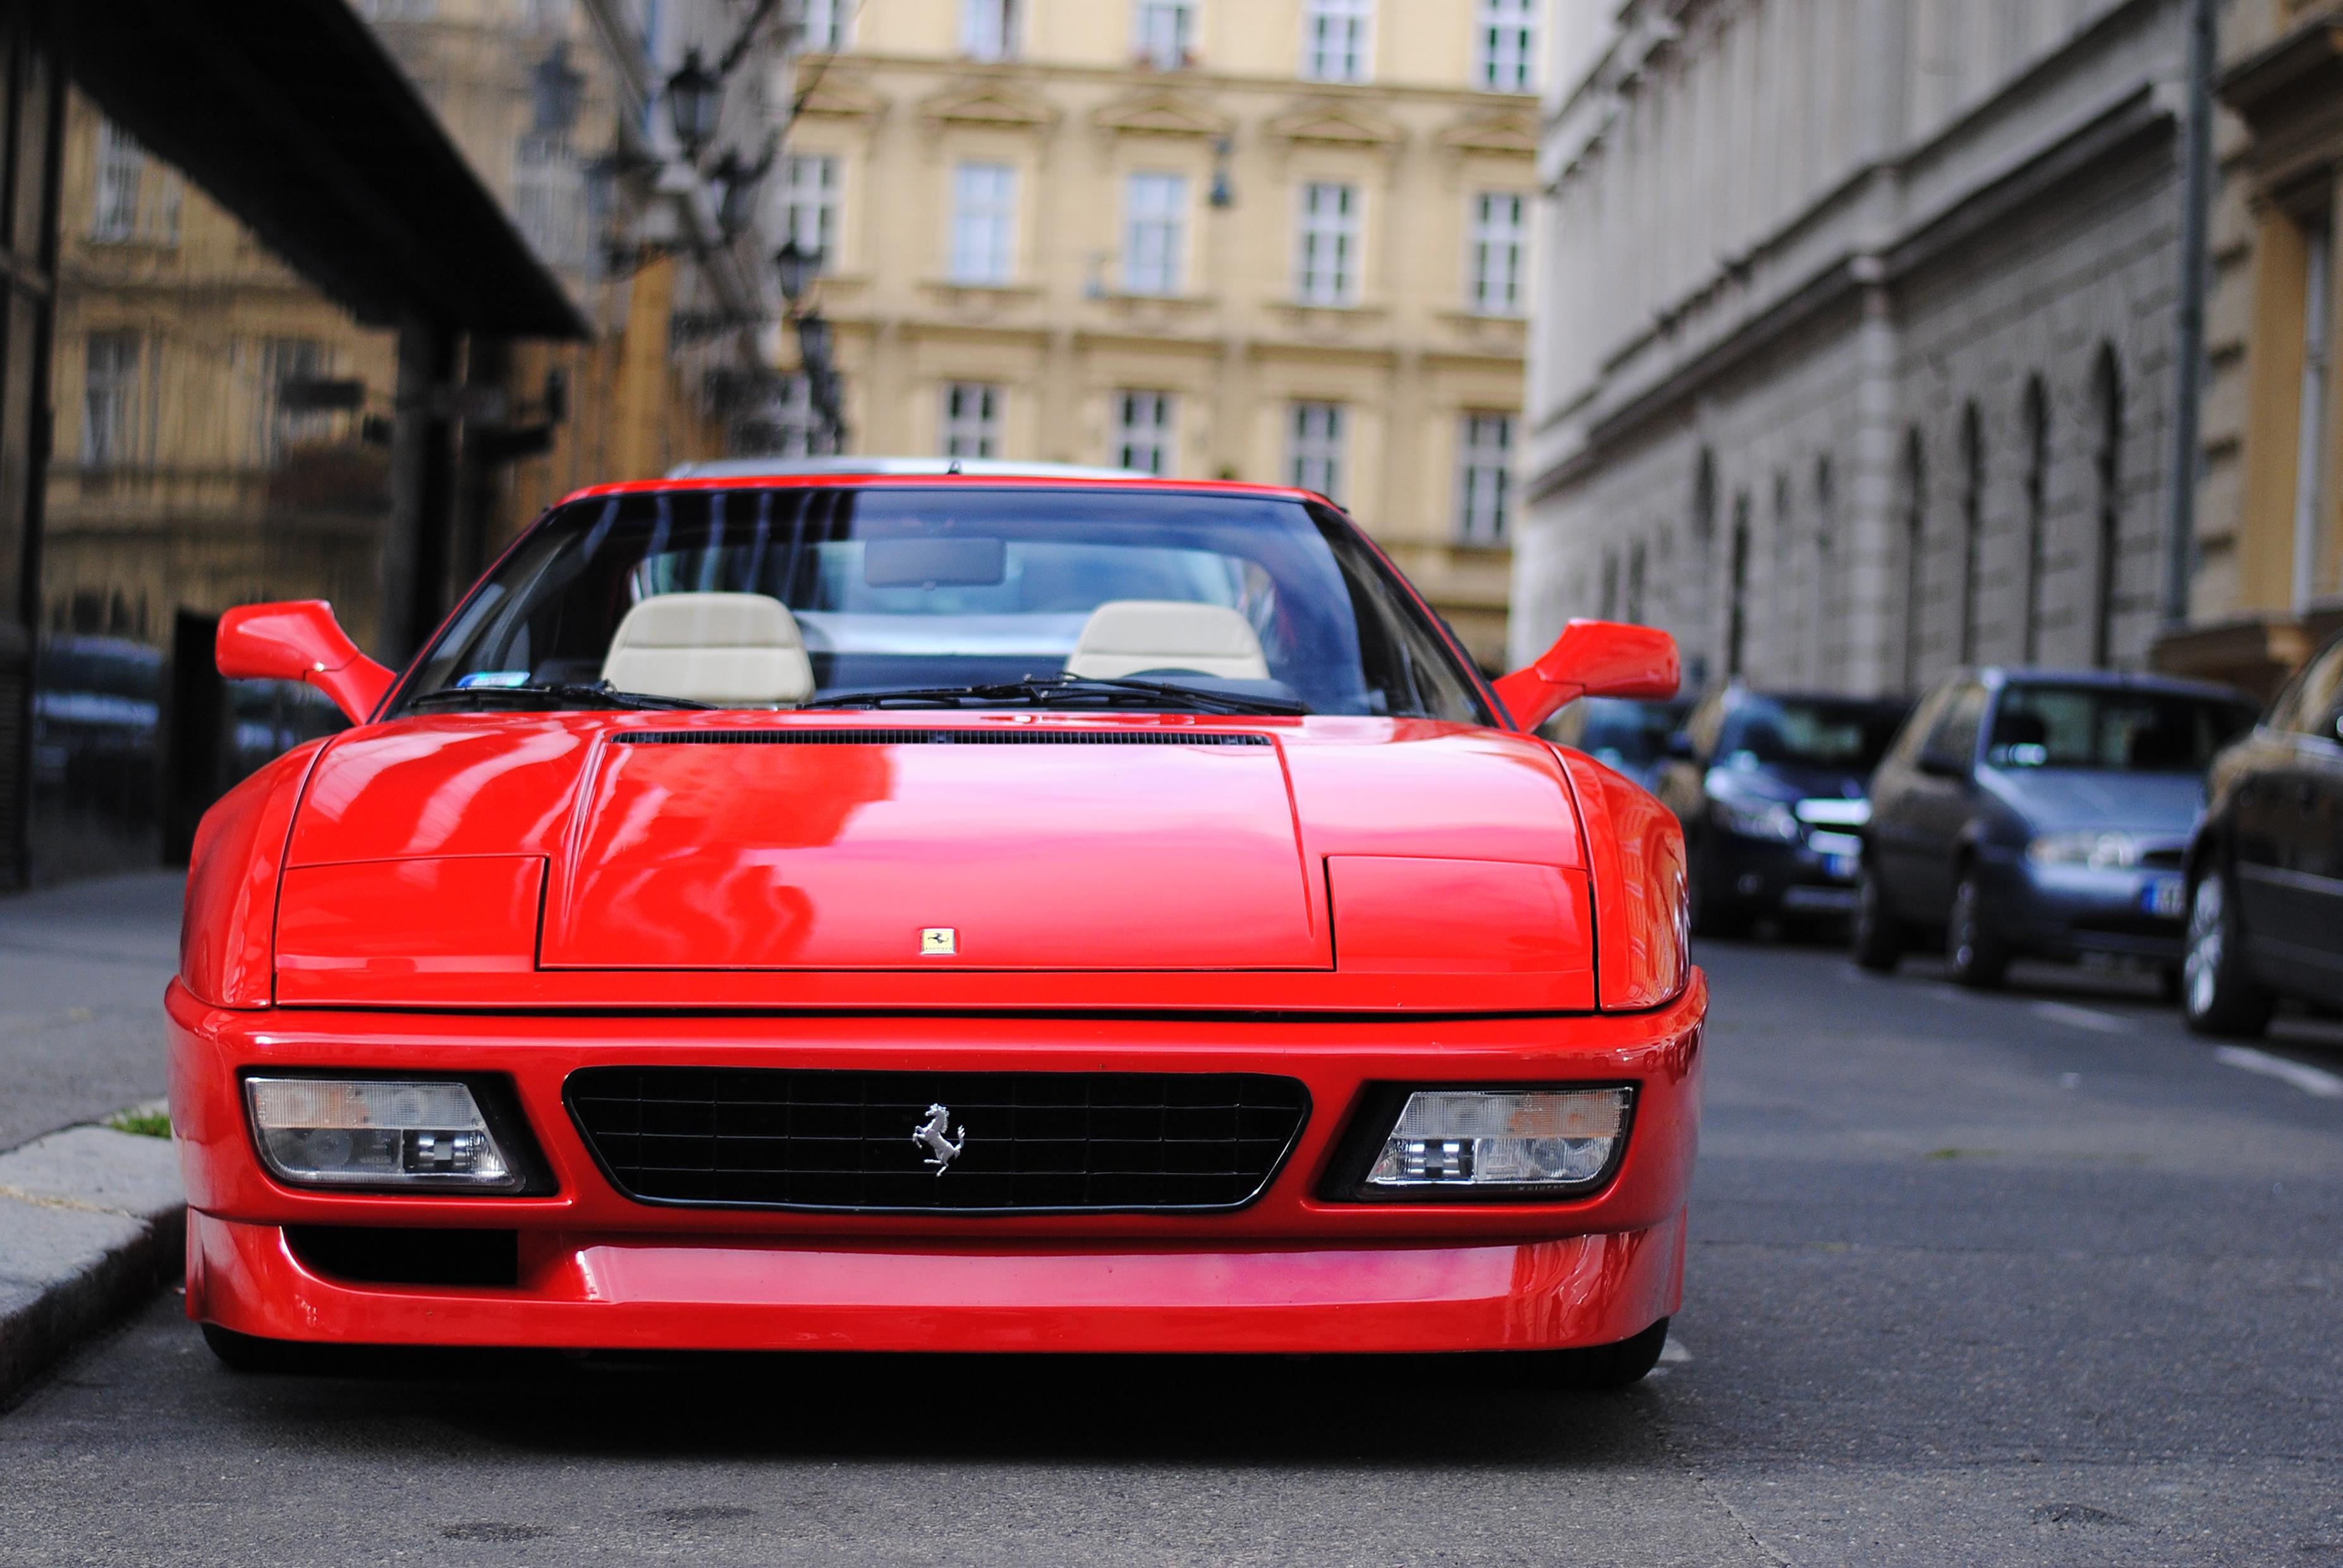 Fondos De Pantalla 50mm Nikon Hungría Budapest Ferrari